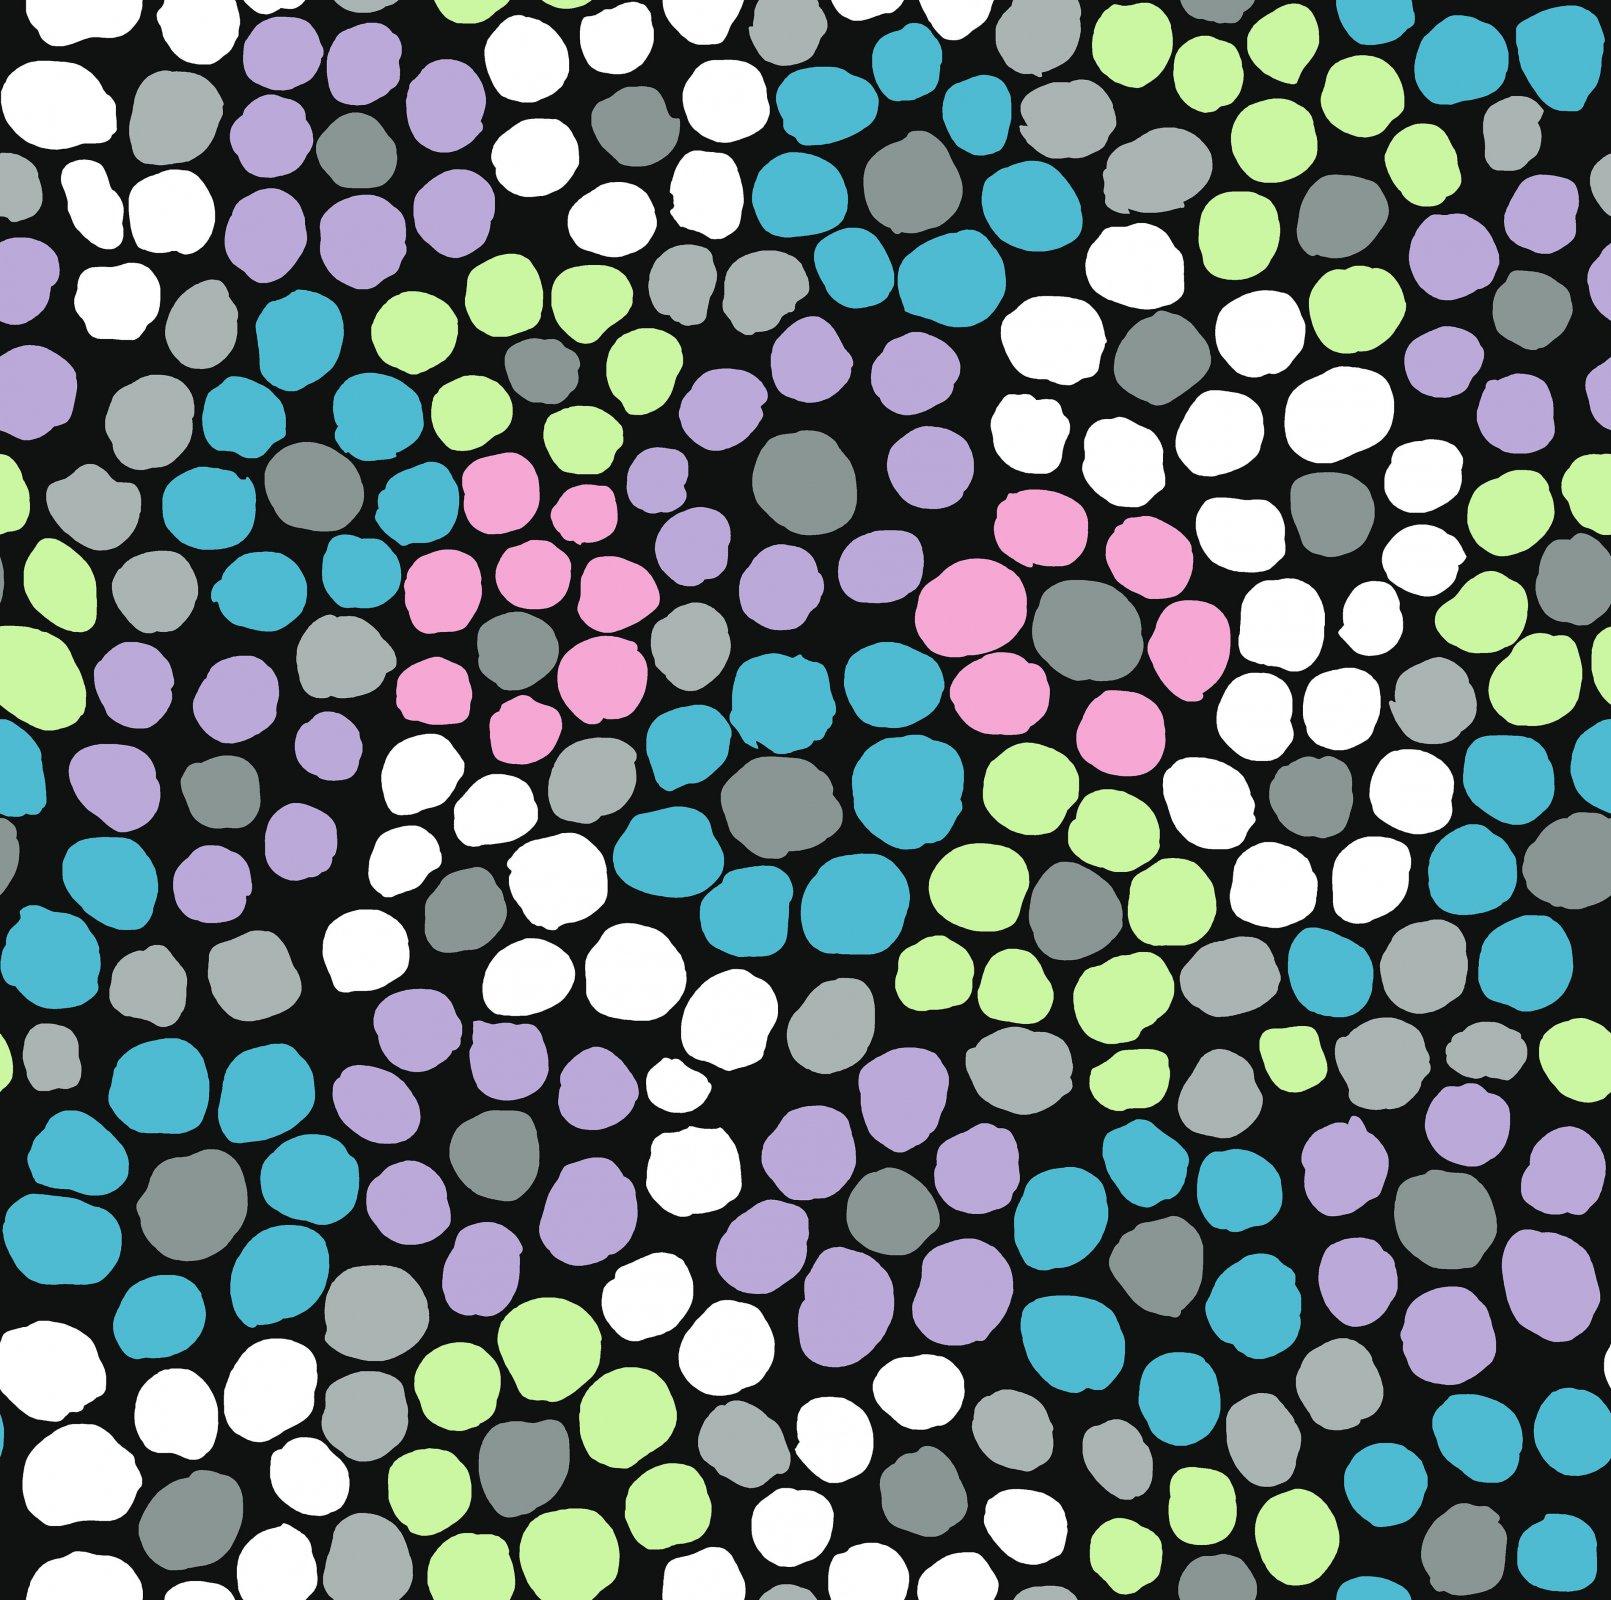 PWBM077.STONE - Flower Dot